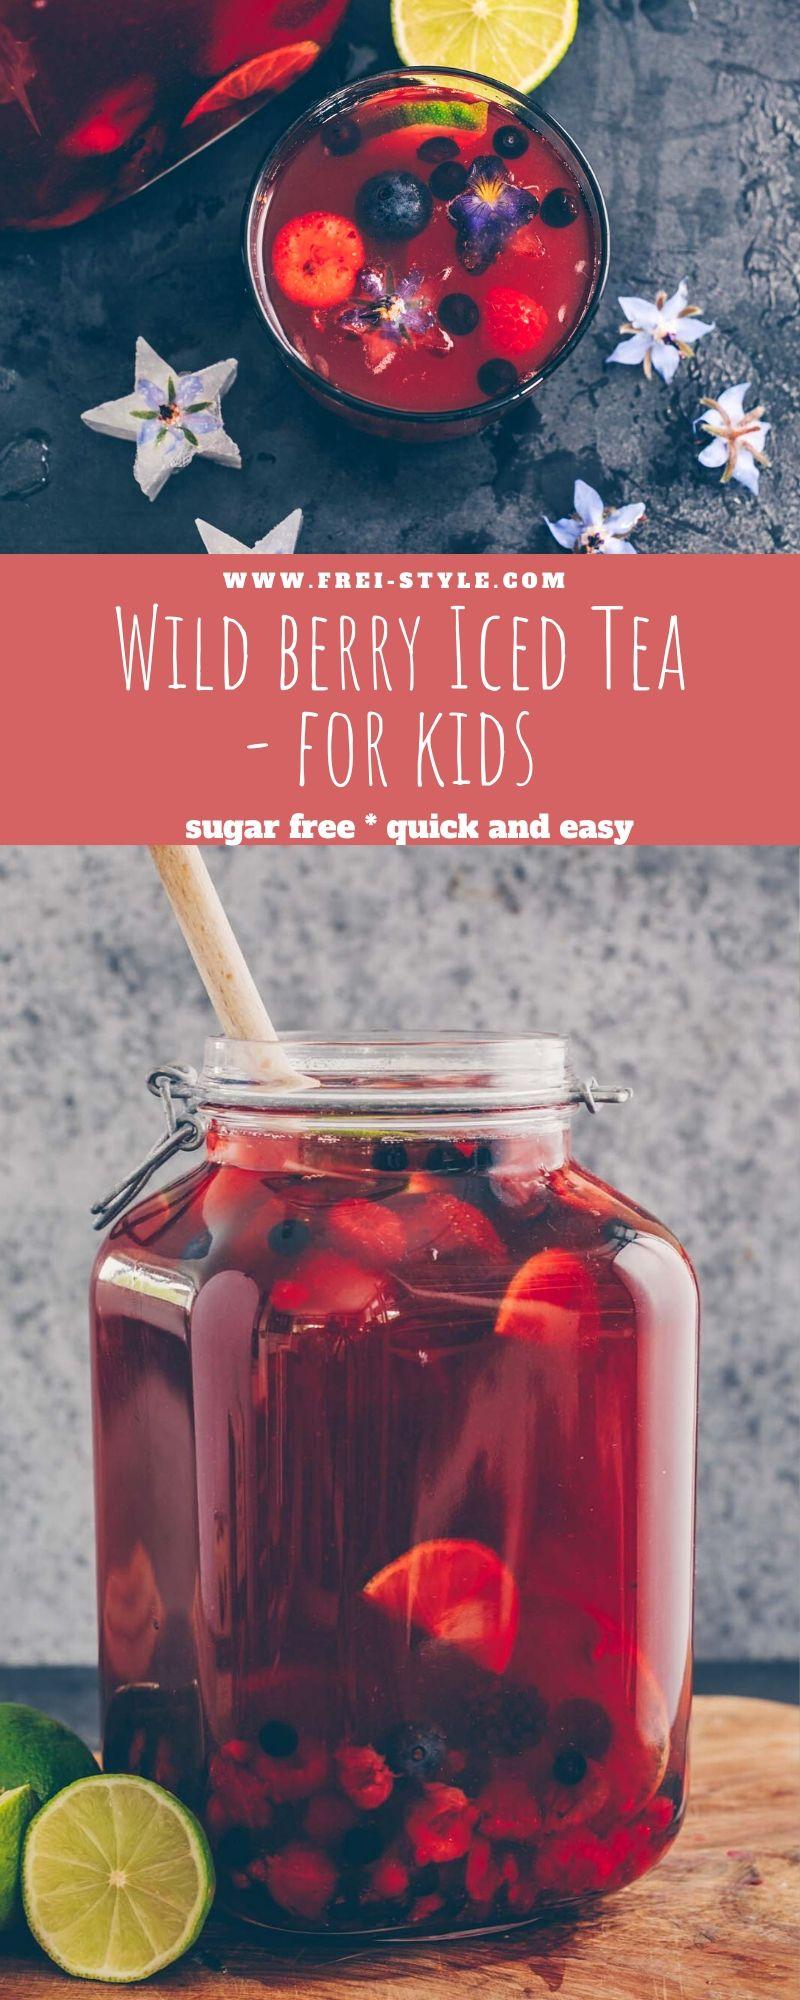 Wild Berry iced tea